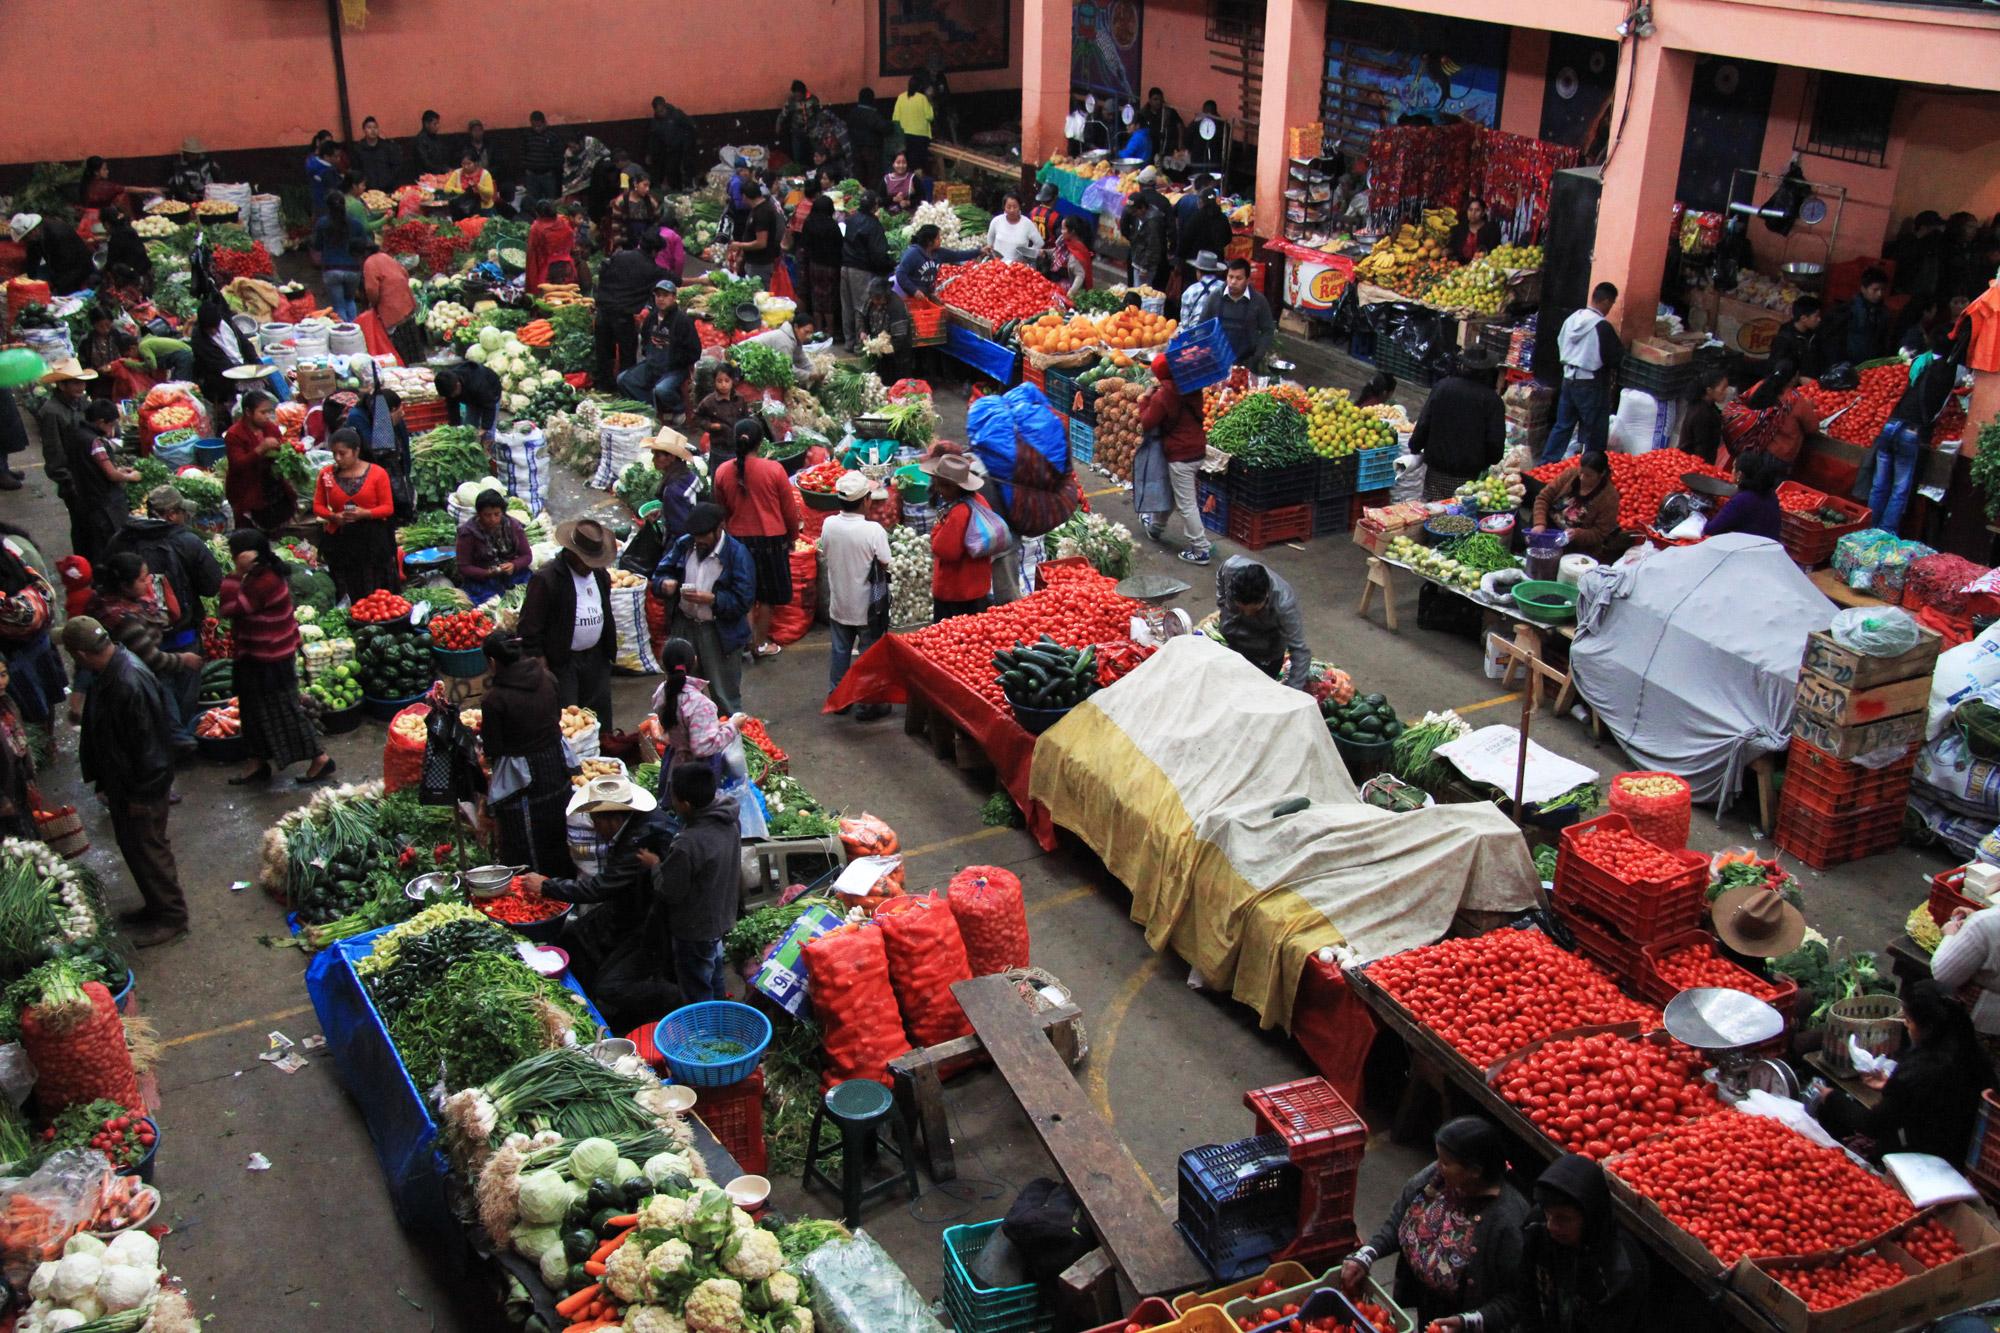 Guatemala 2015 - dag 17 - De grote markt van Chichicastenango